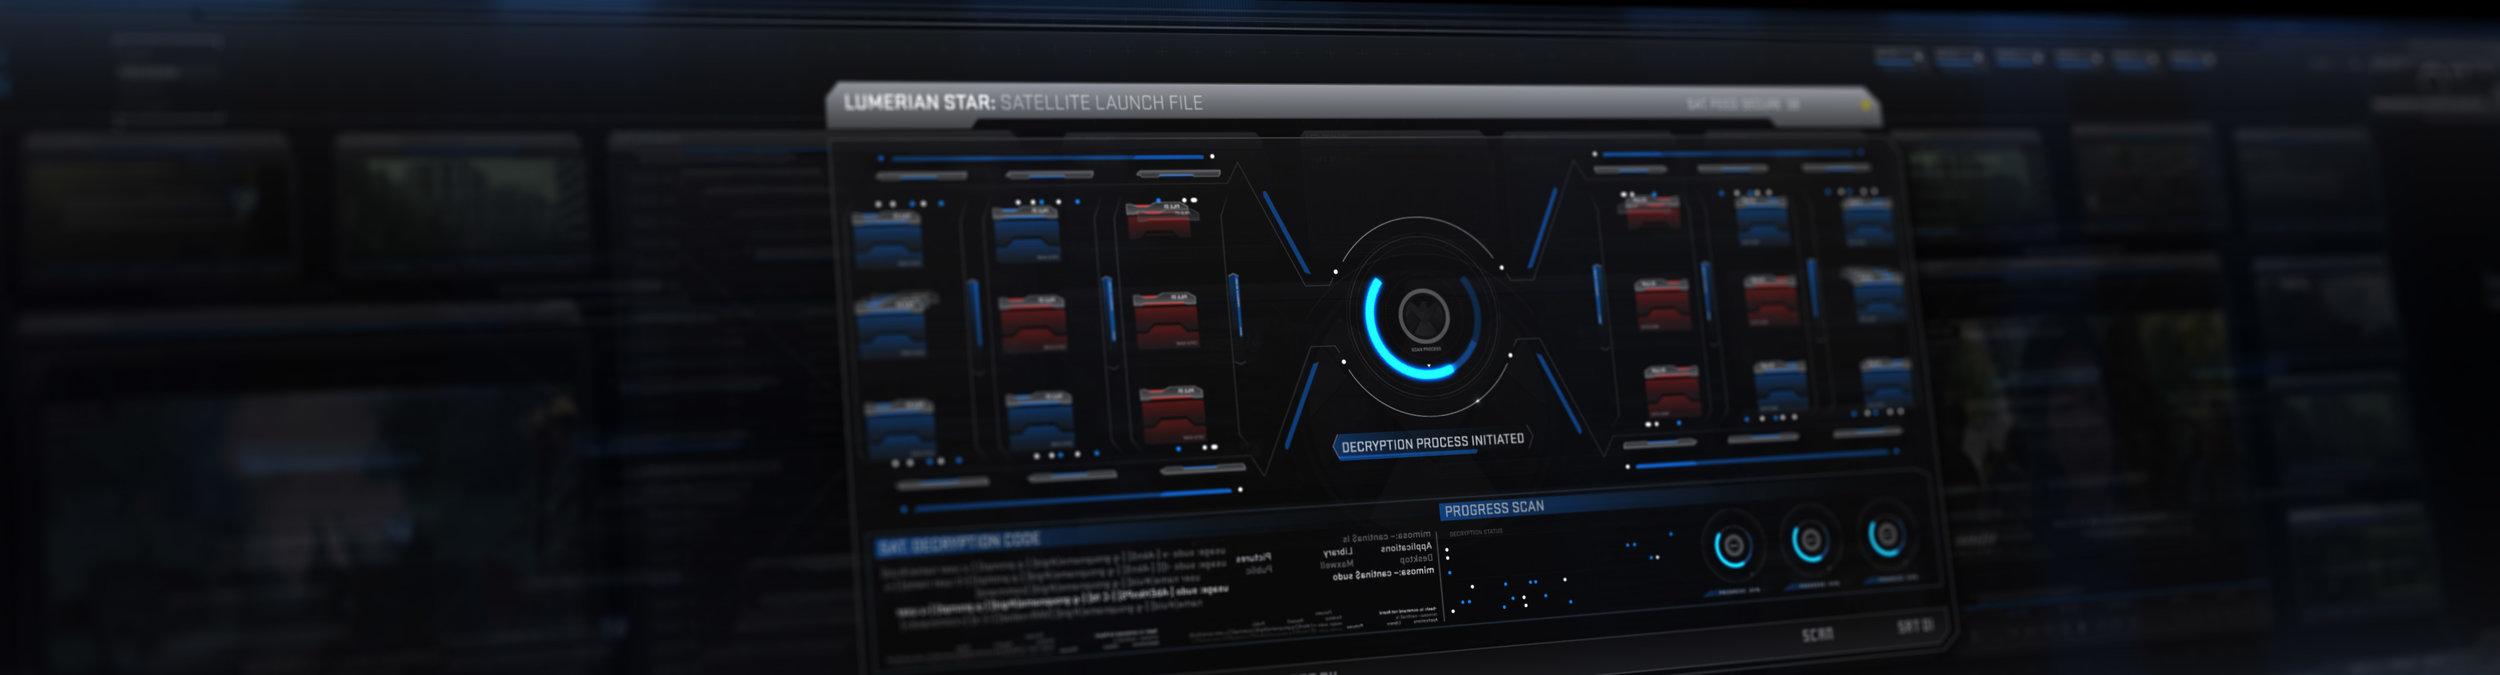 ZPD1060_monitor 2 (01048).jpg